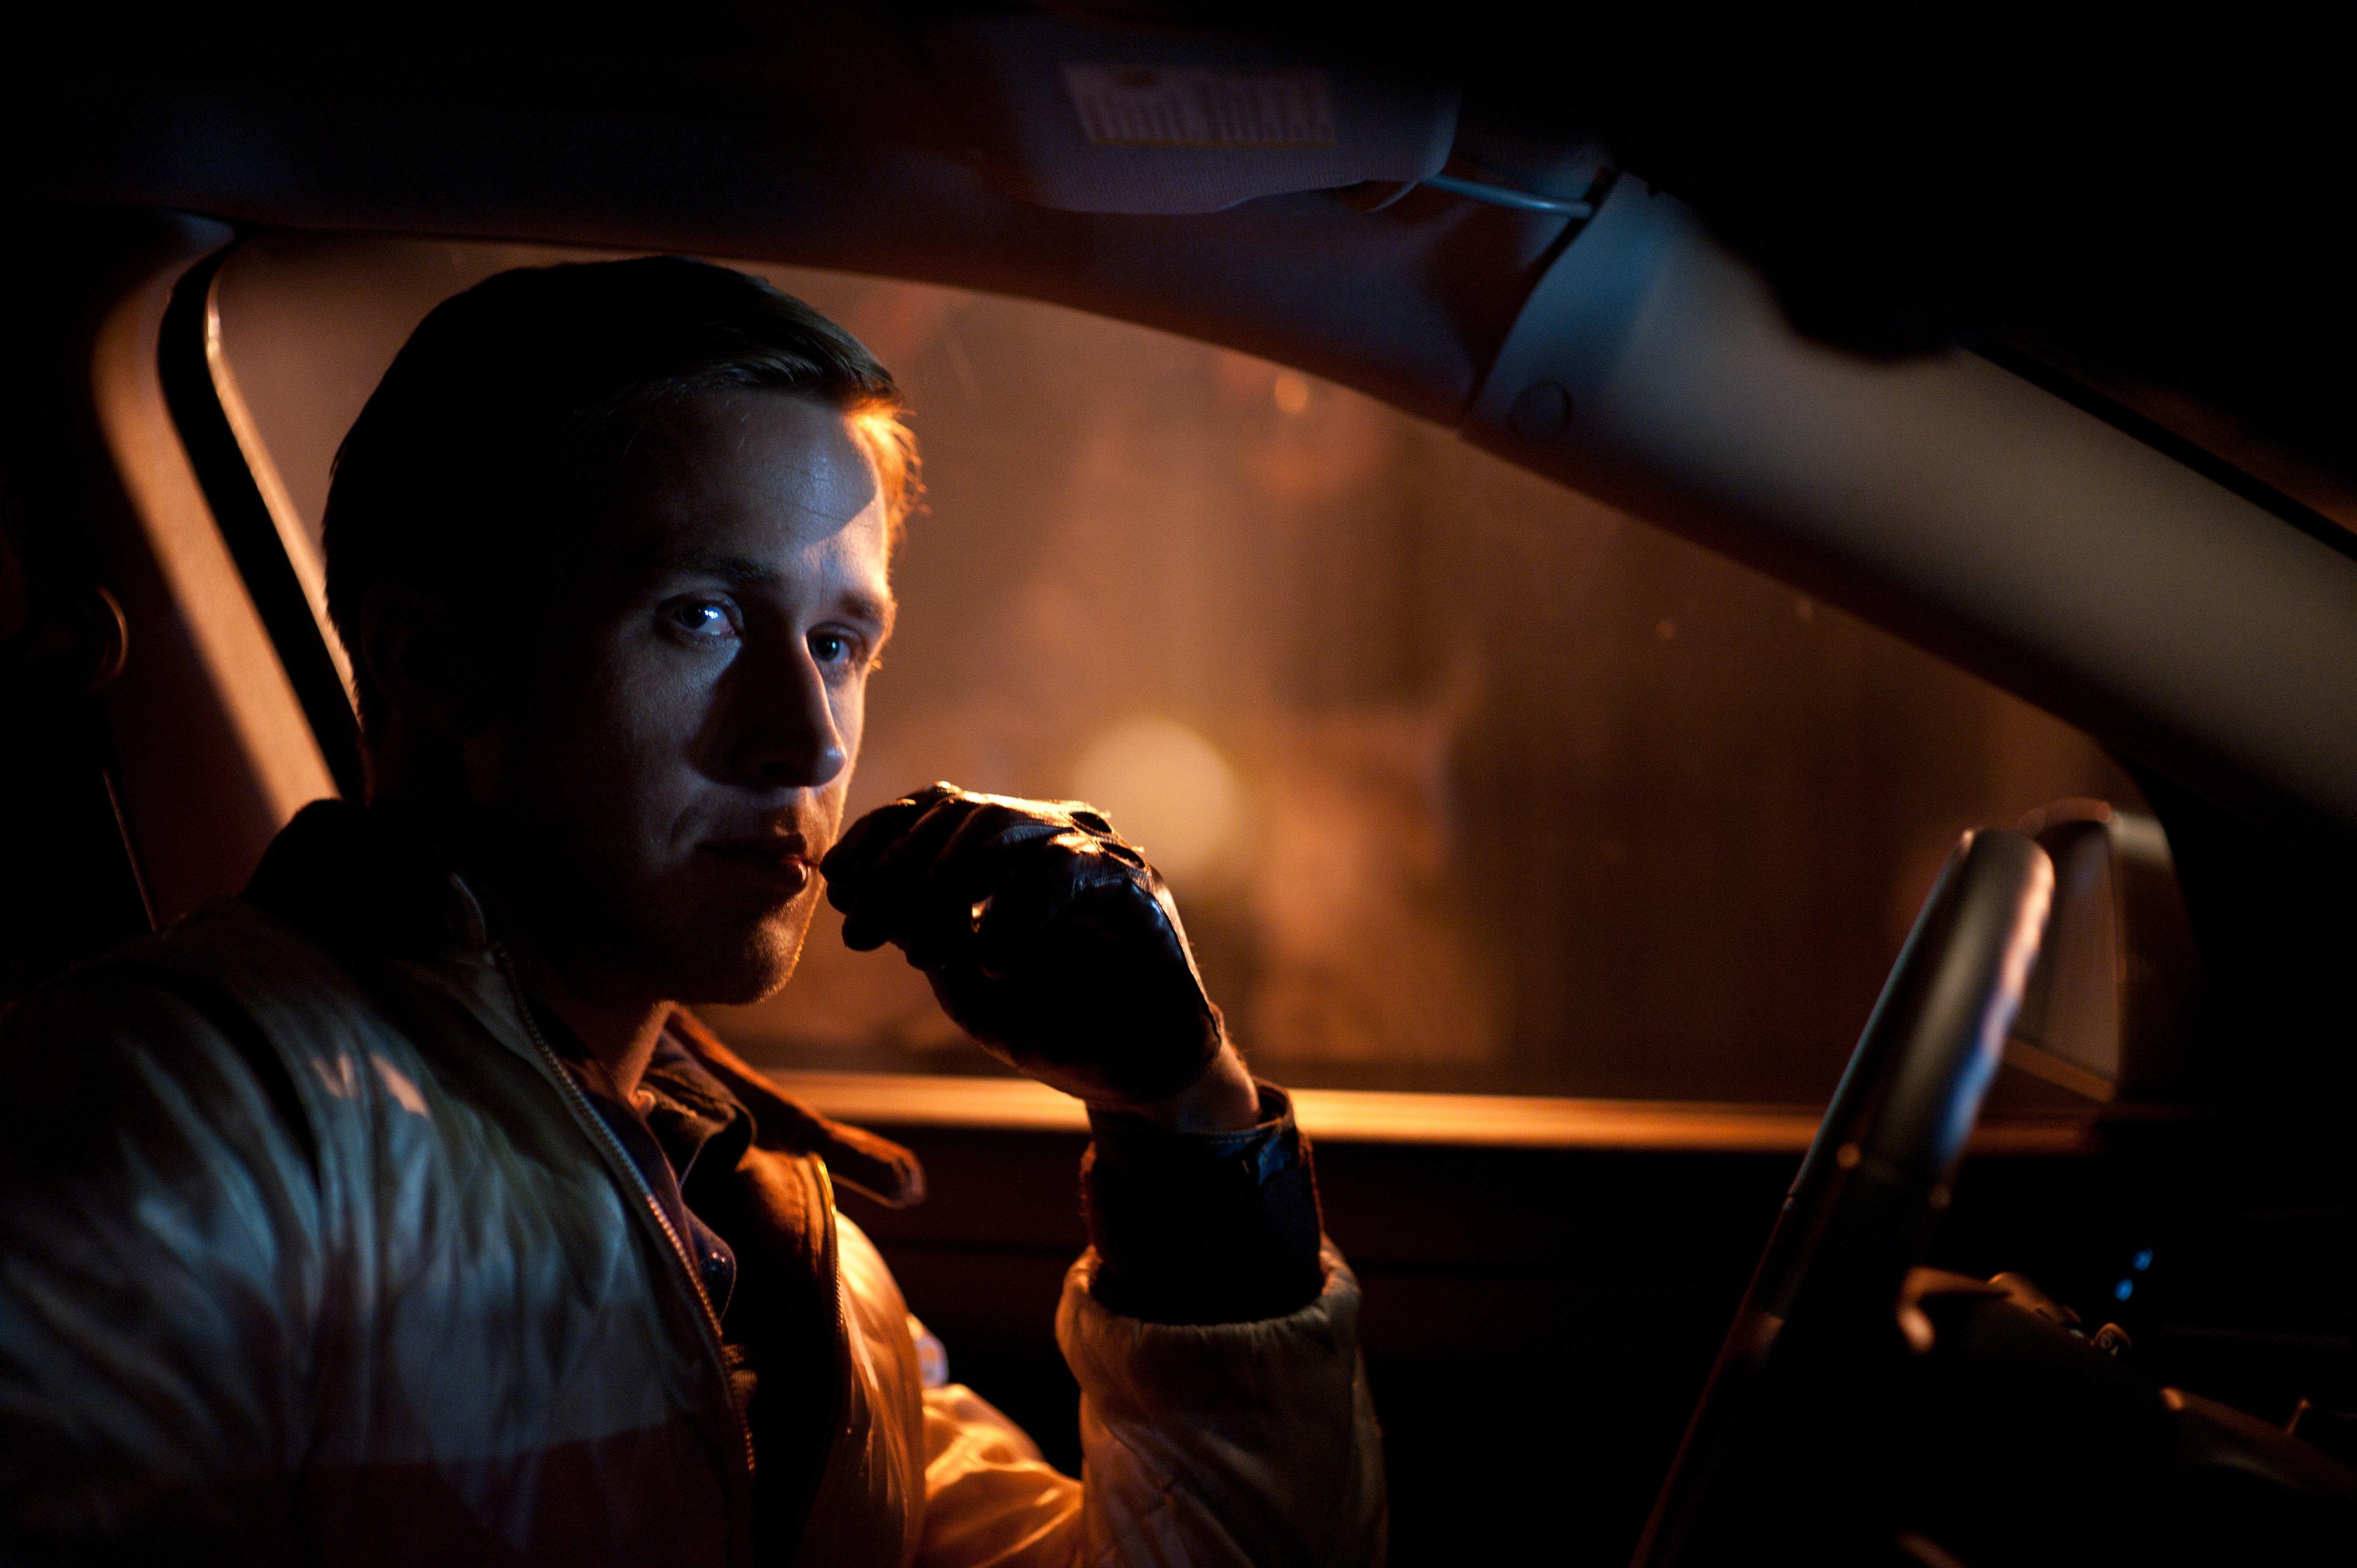 Drive : un film toujours aussi culte